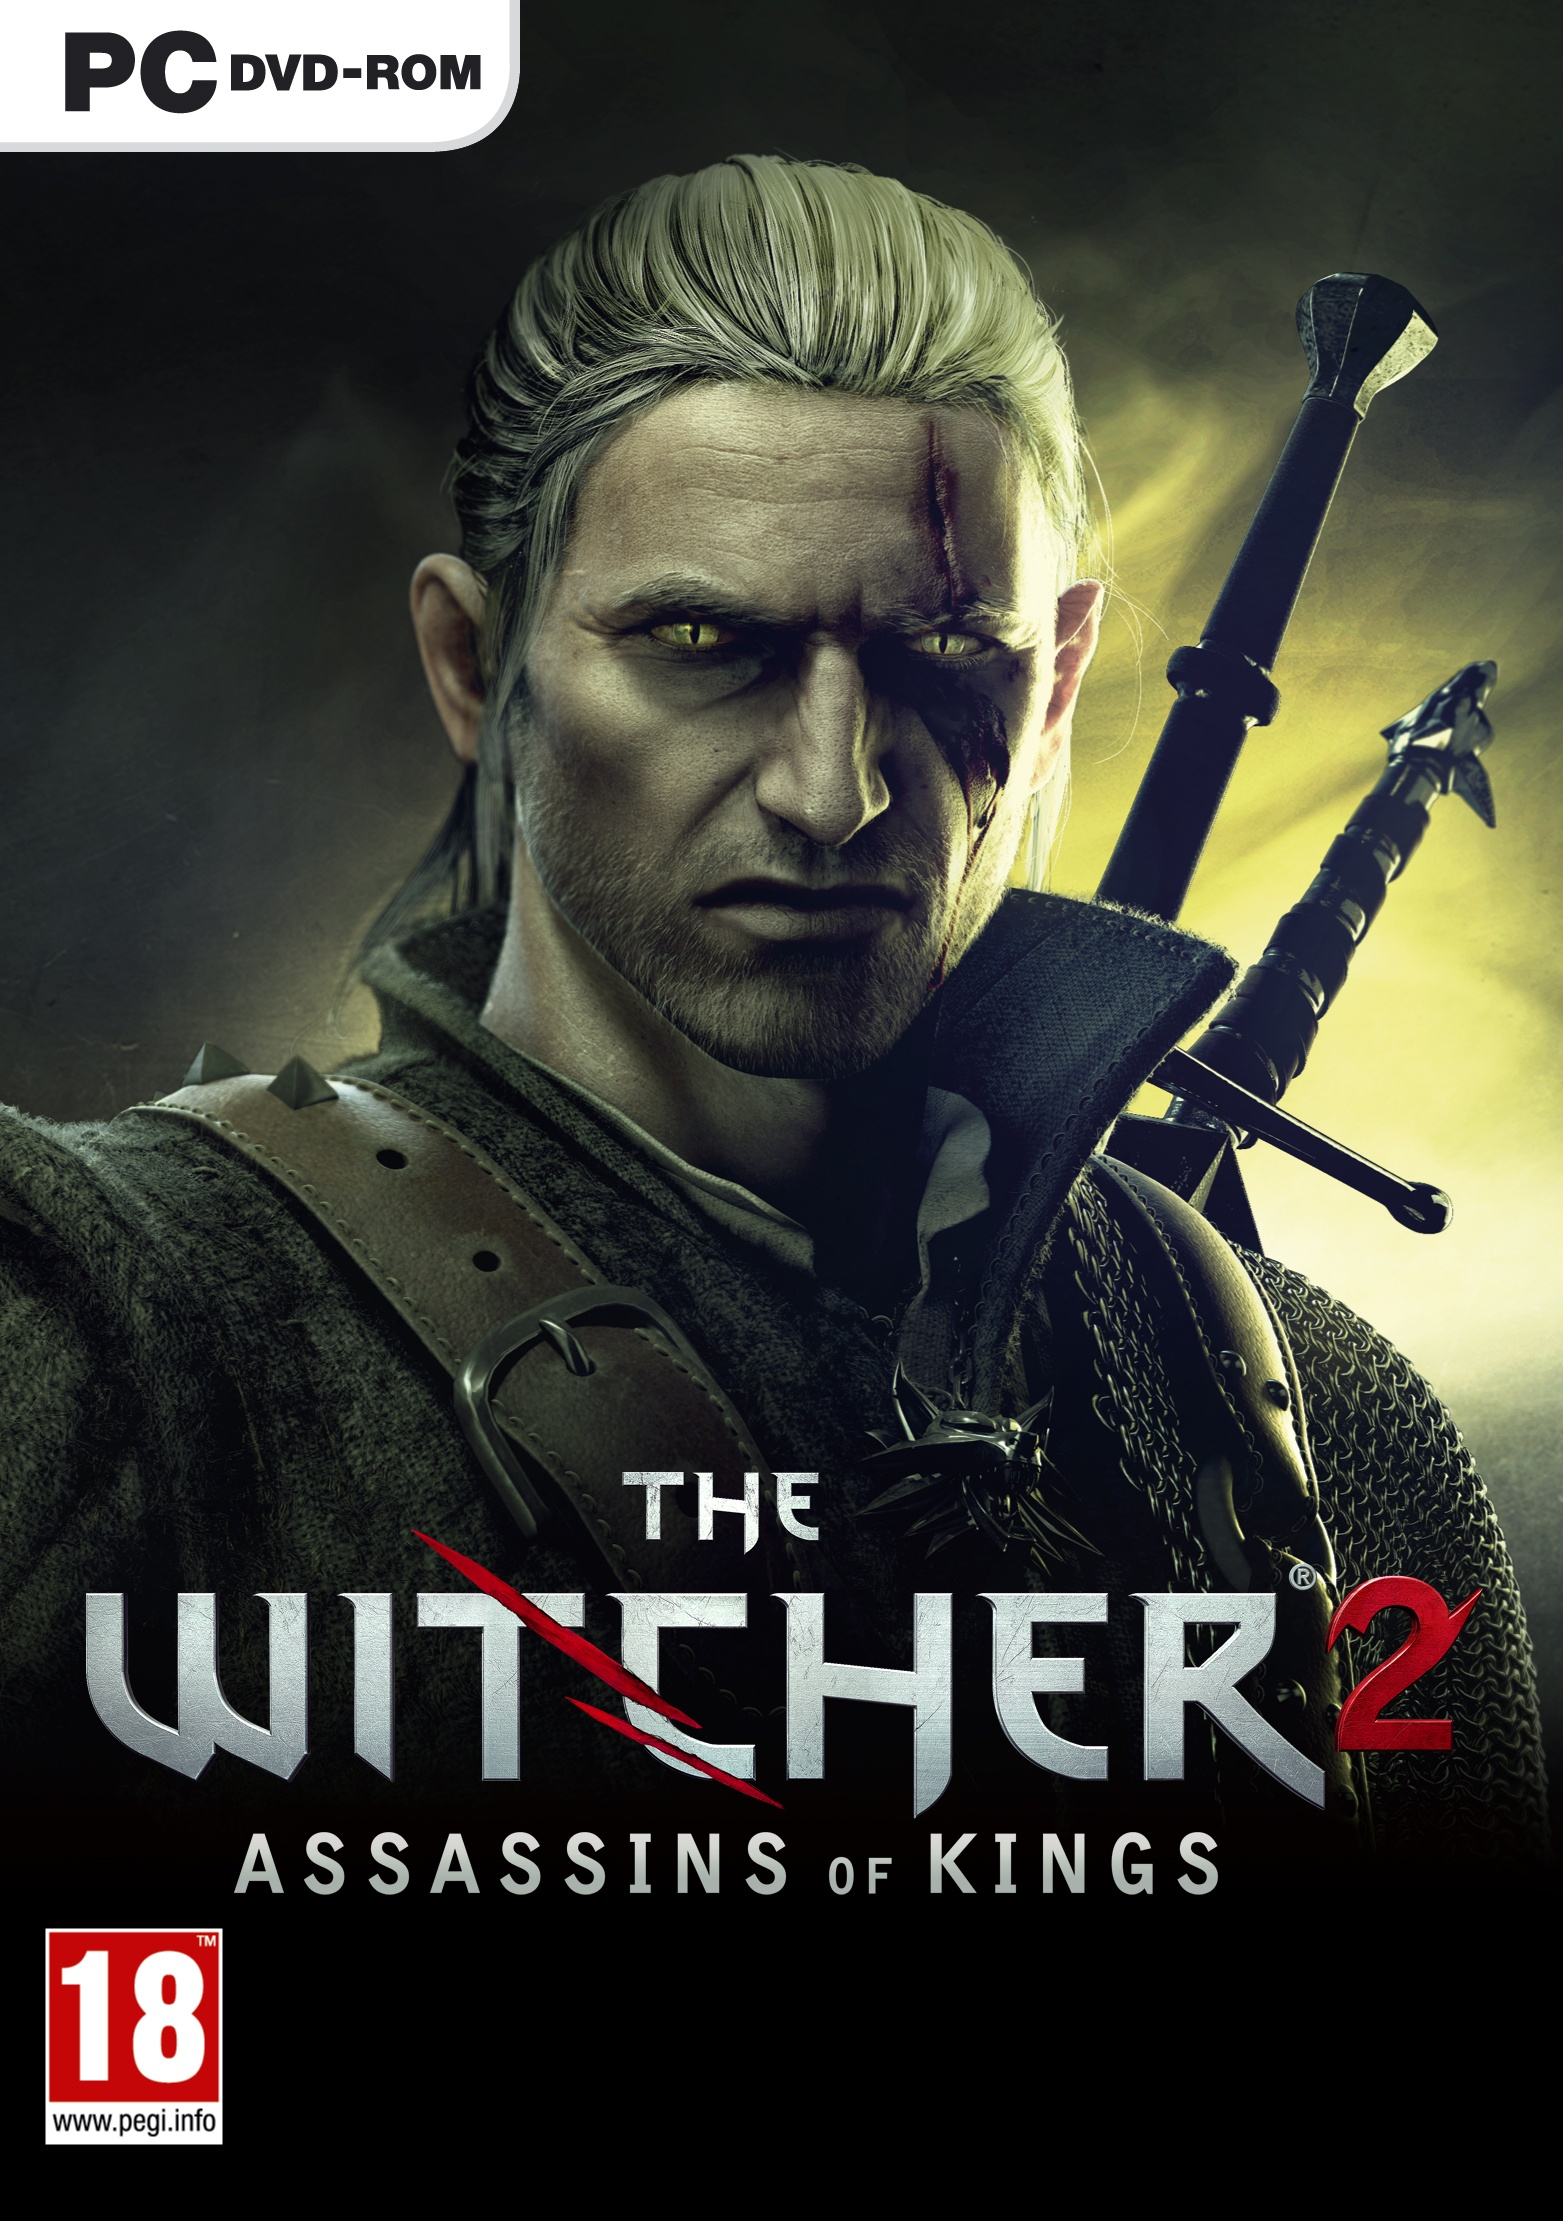 Witcher 2 Abstürze